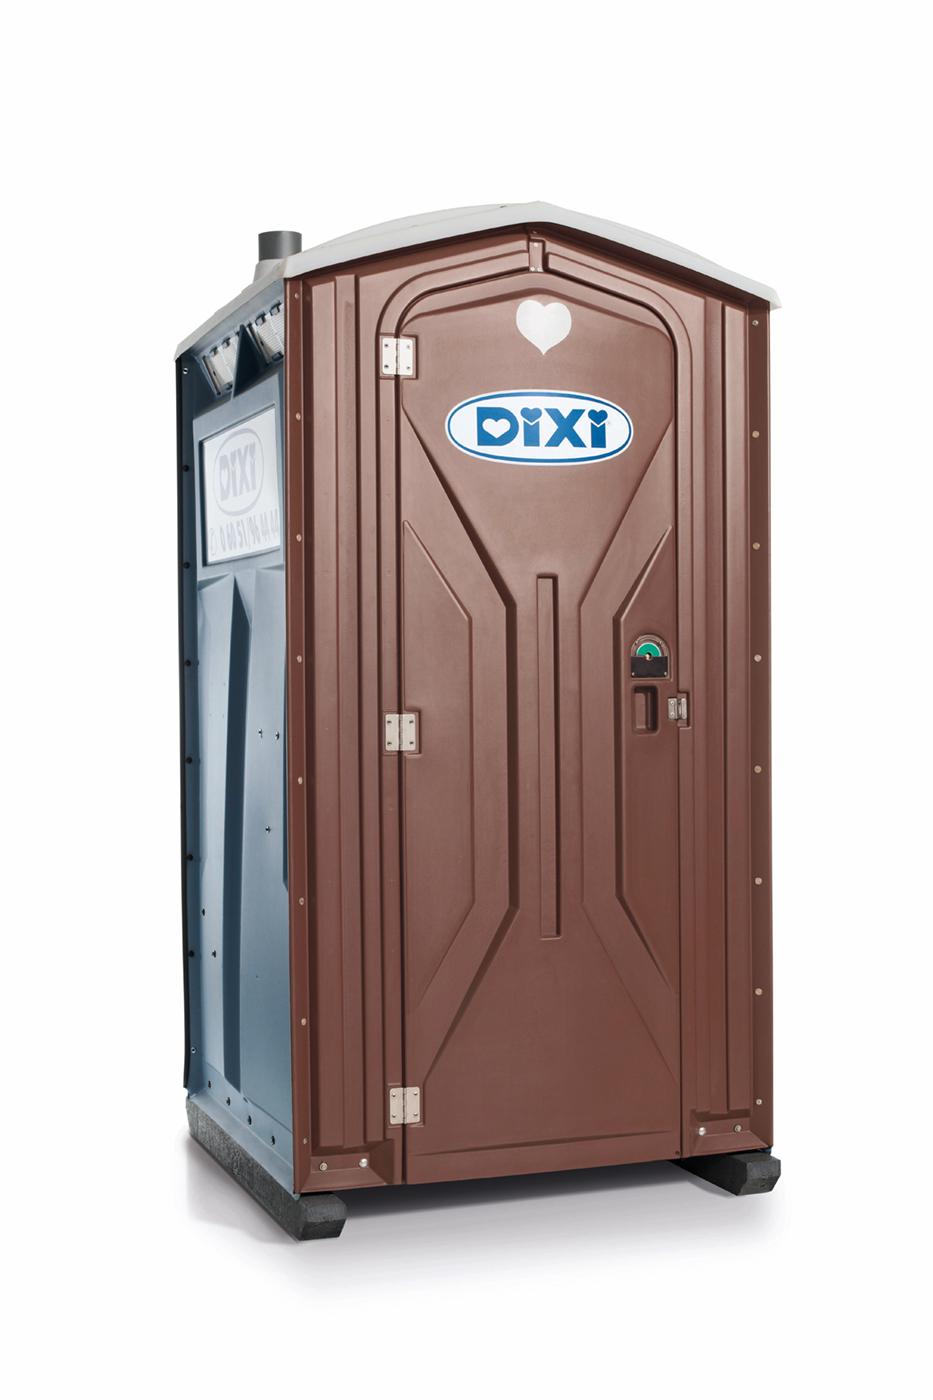 dixi b das original unter den mobilen toilettenkabinen toi toi dixi. Black Bedroom Furniture Sets. Home Design Ideas